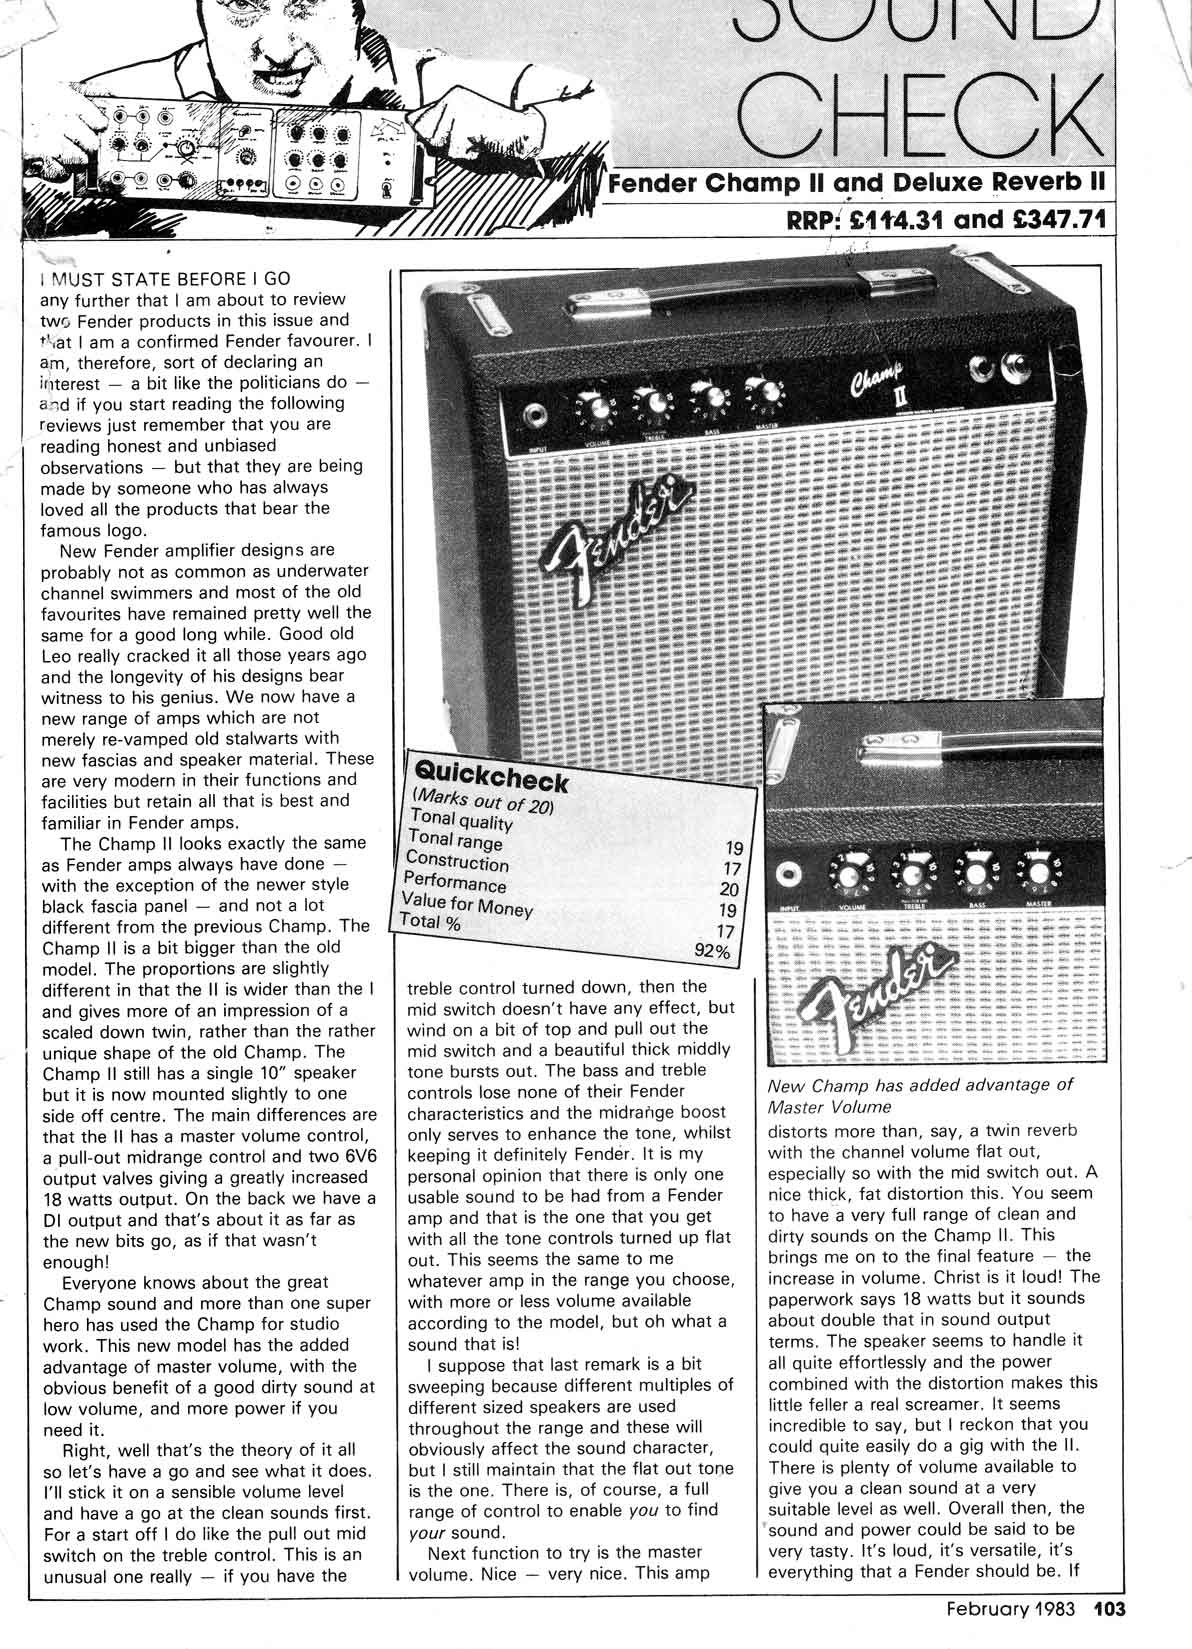 schematics for rivera era fender amps page 1